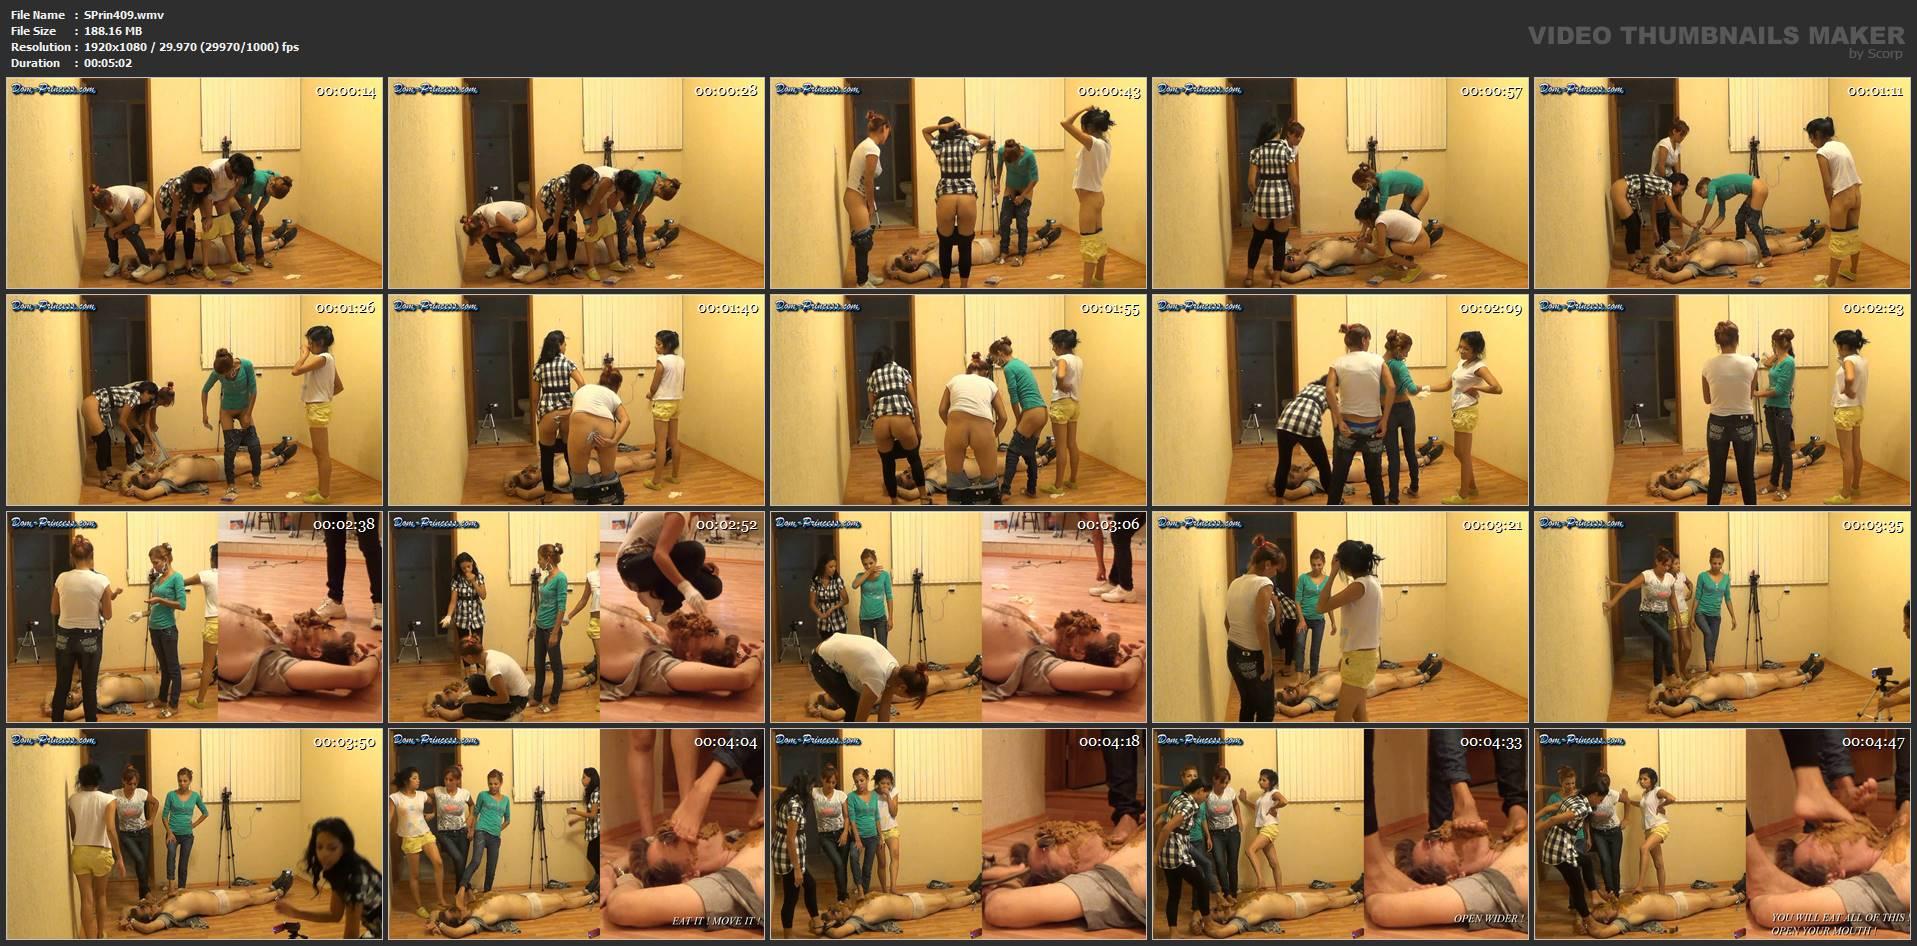 [SCAT-PRINCESS] Occupied Toilet. Next 5 Minutes into the Dispute Part 5 [FULL HD][1080p][WMV]